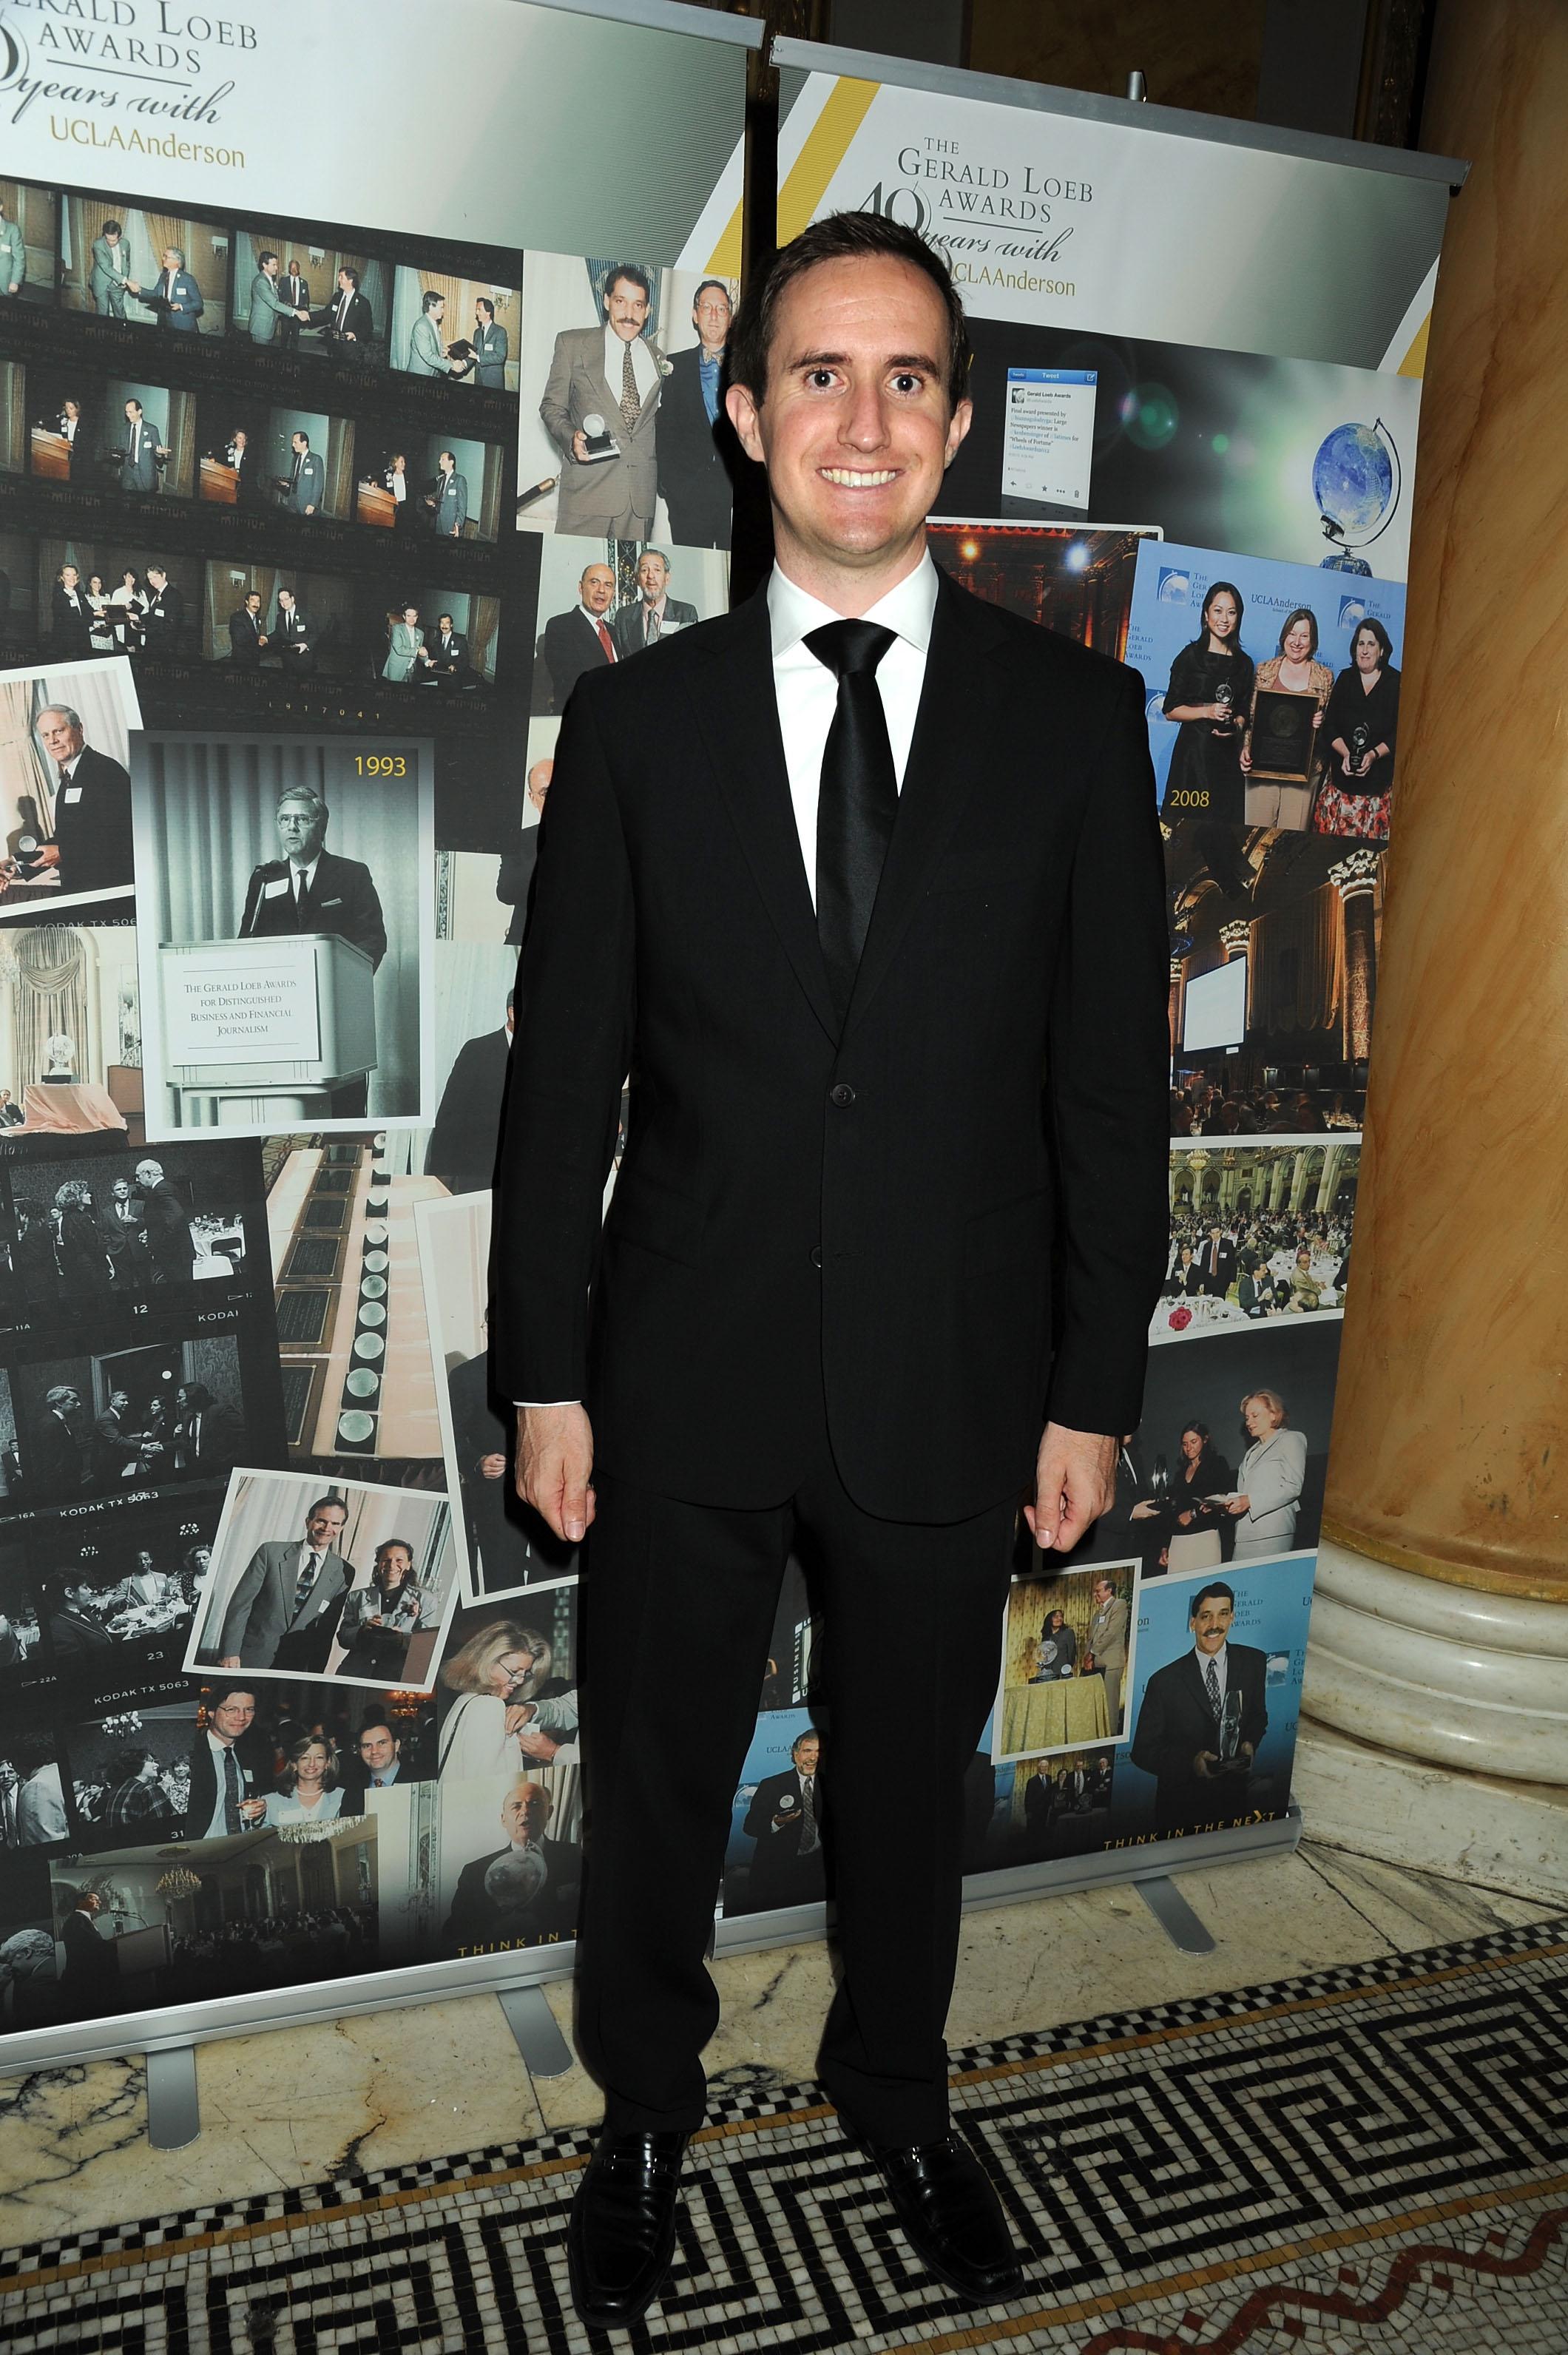 2013 Gerald Loeb Awards - Cocktails